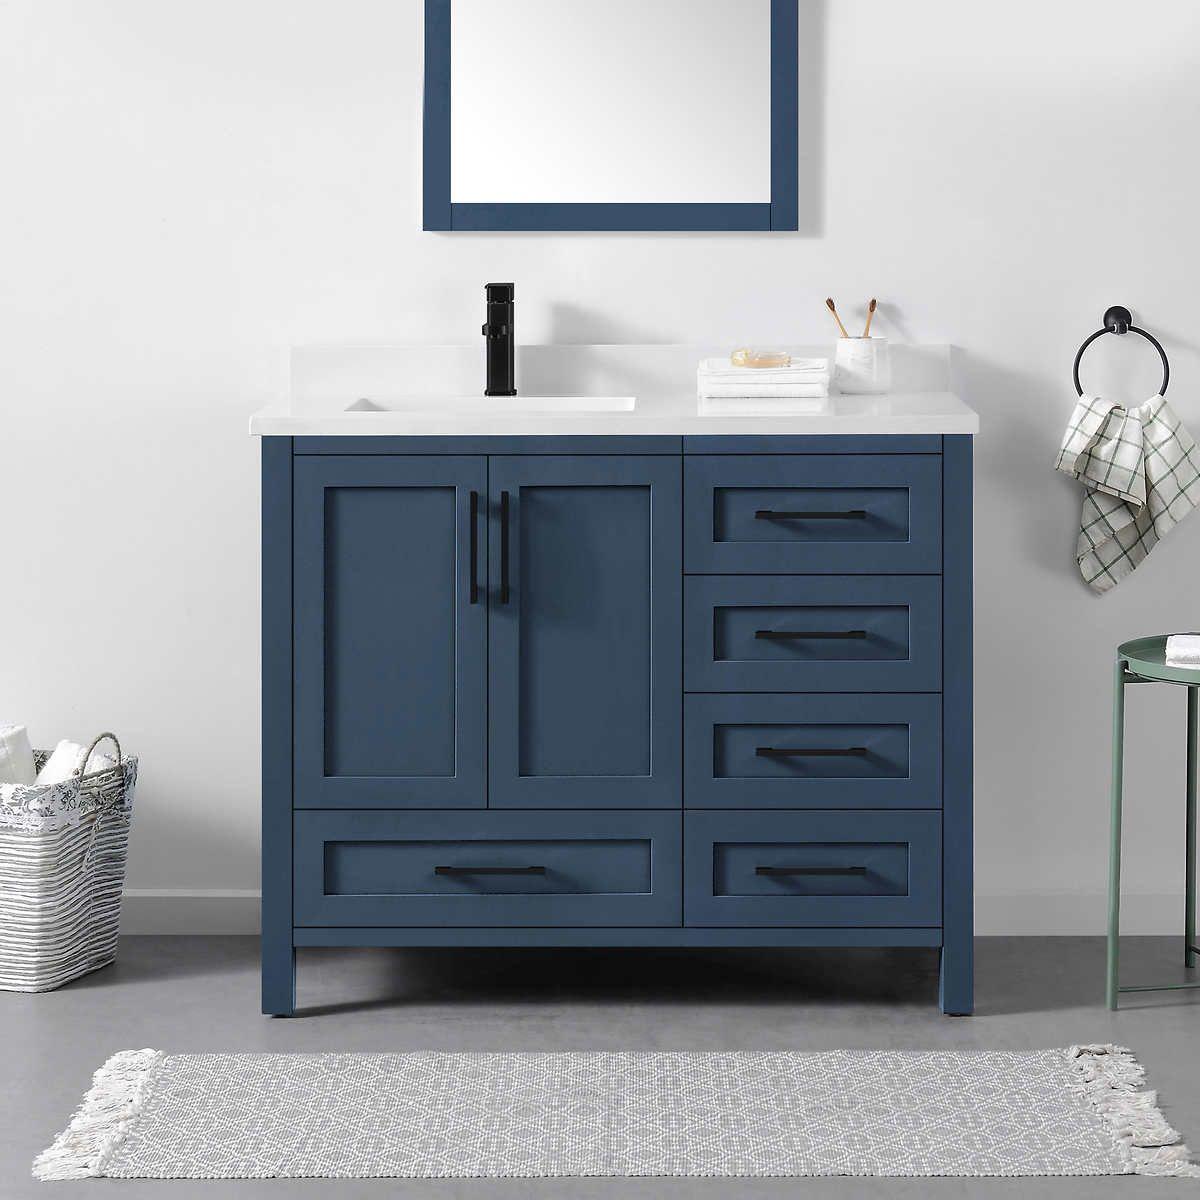 Ove Decors Lourdes 42 Vanity Blue Bathroom Vanity Single Sink Bathroom Vanity Bathroom Sink Vanity